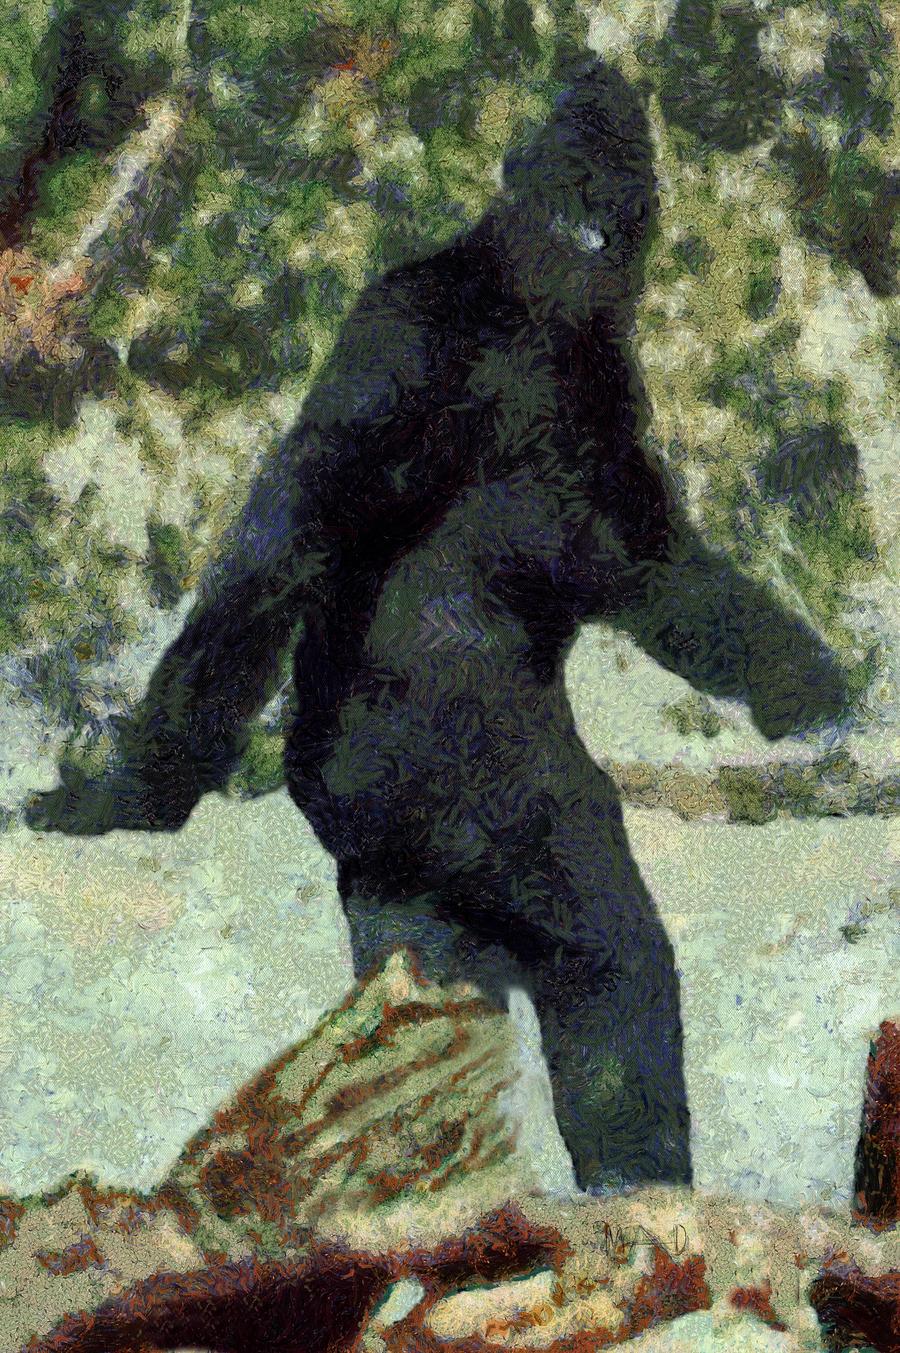 Bigfoot by troglow